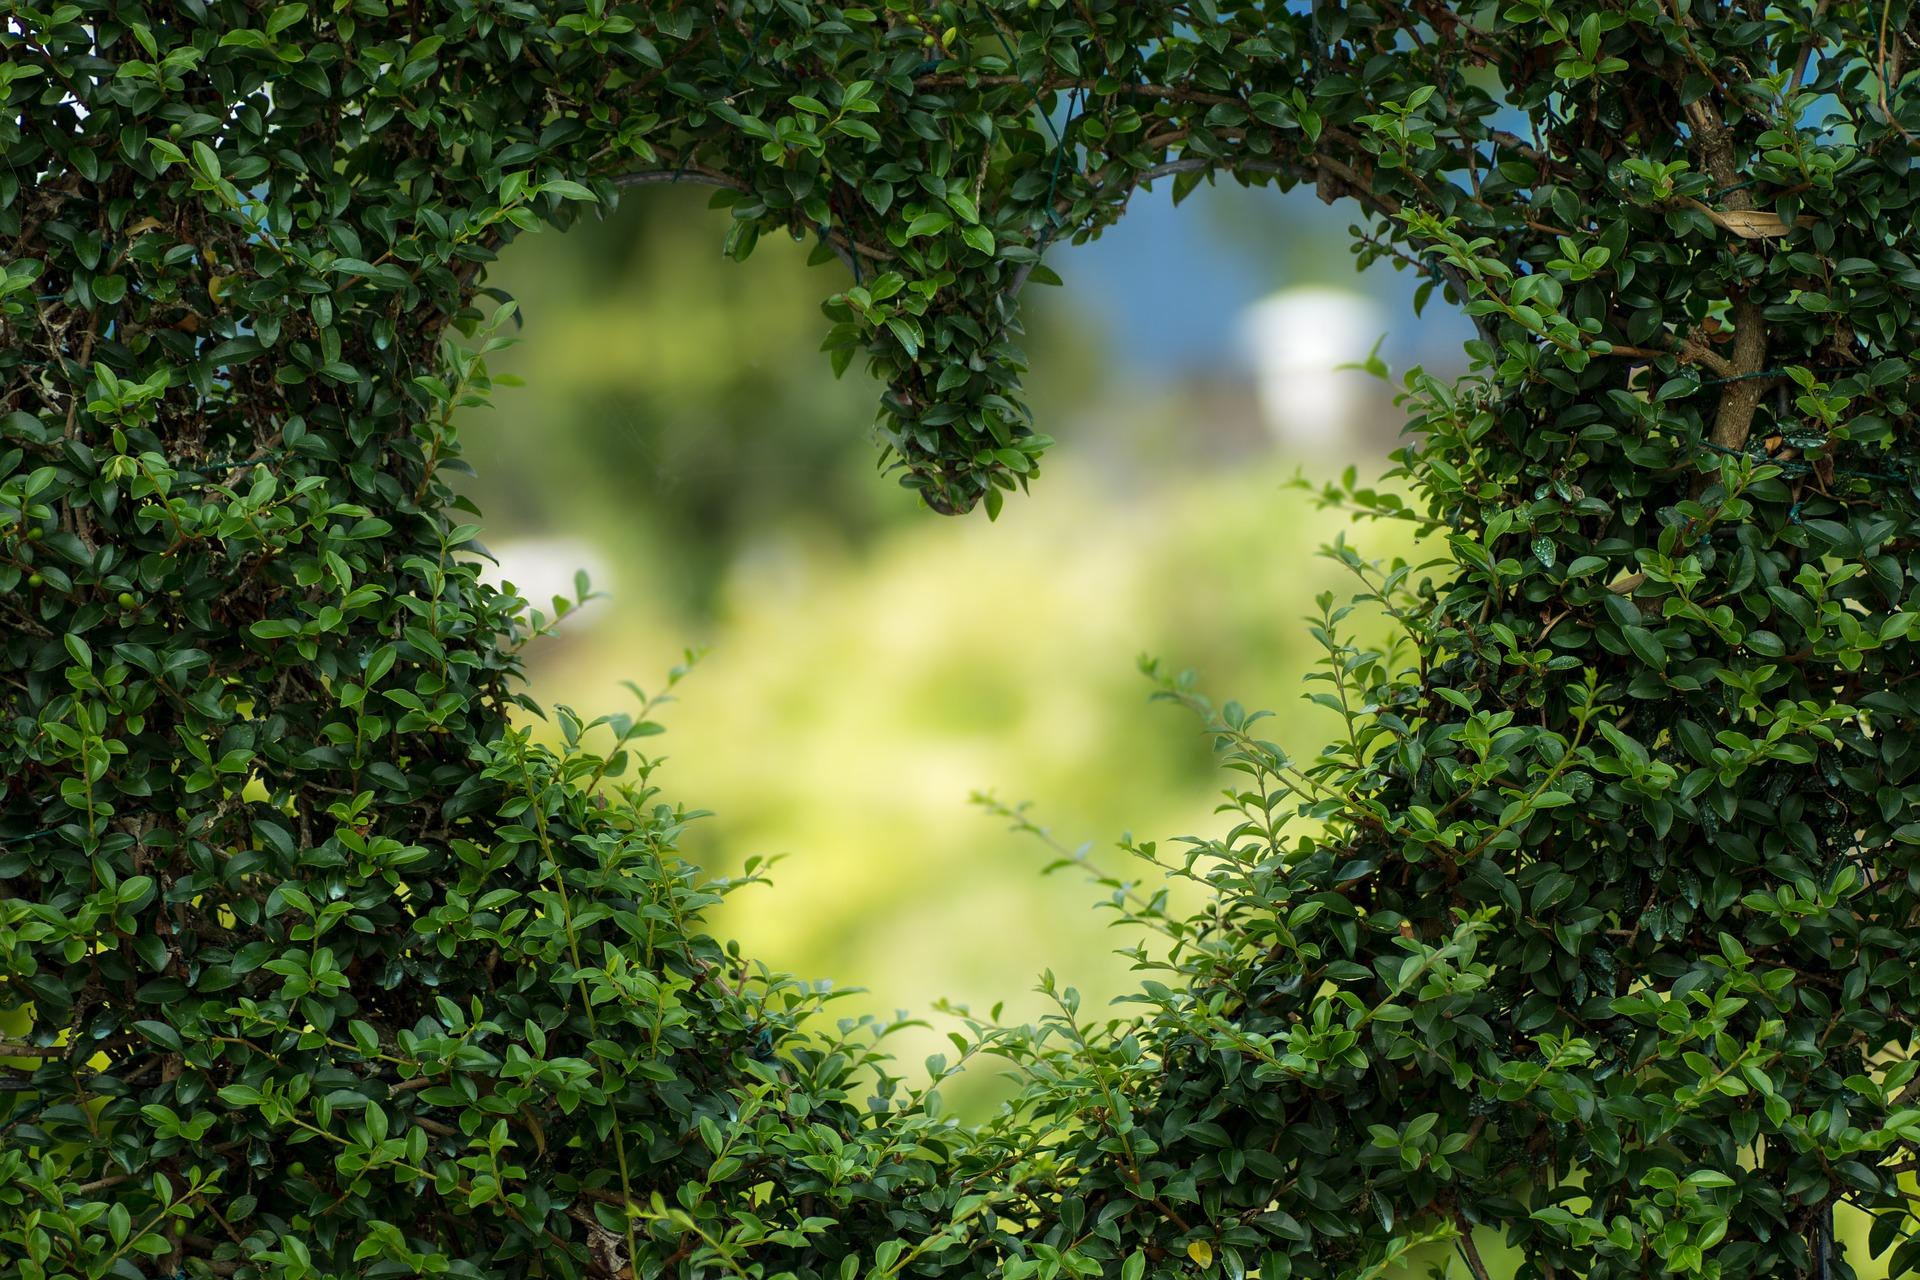 horoscop dragoste -sfatulparintilor.ro - pixabay_com - heart-1192662_1920